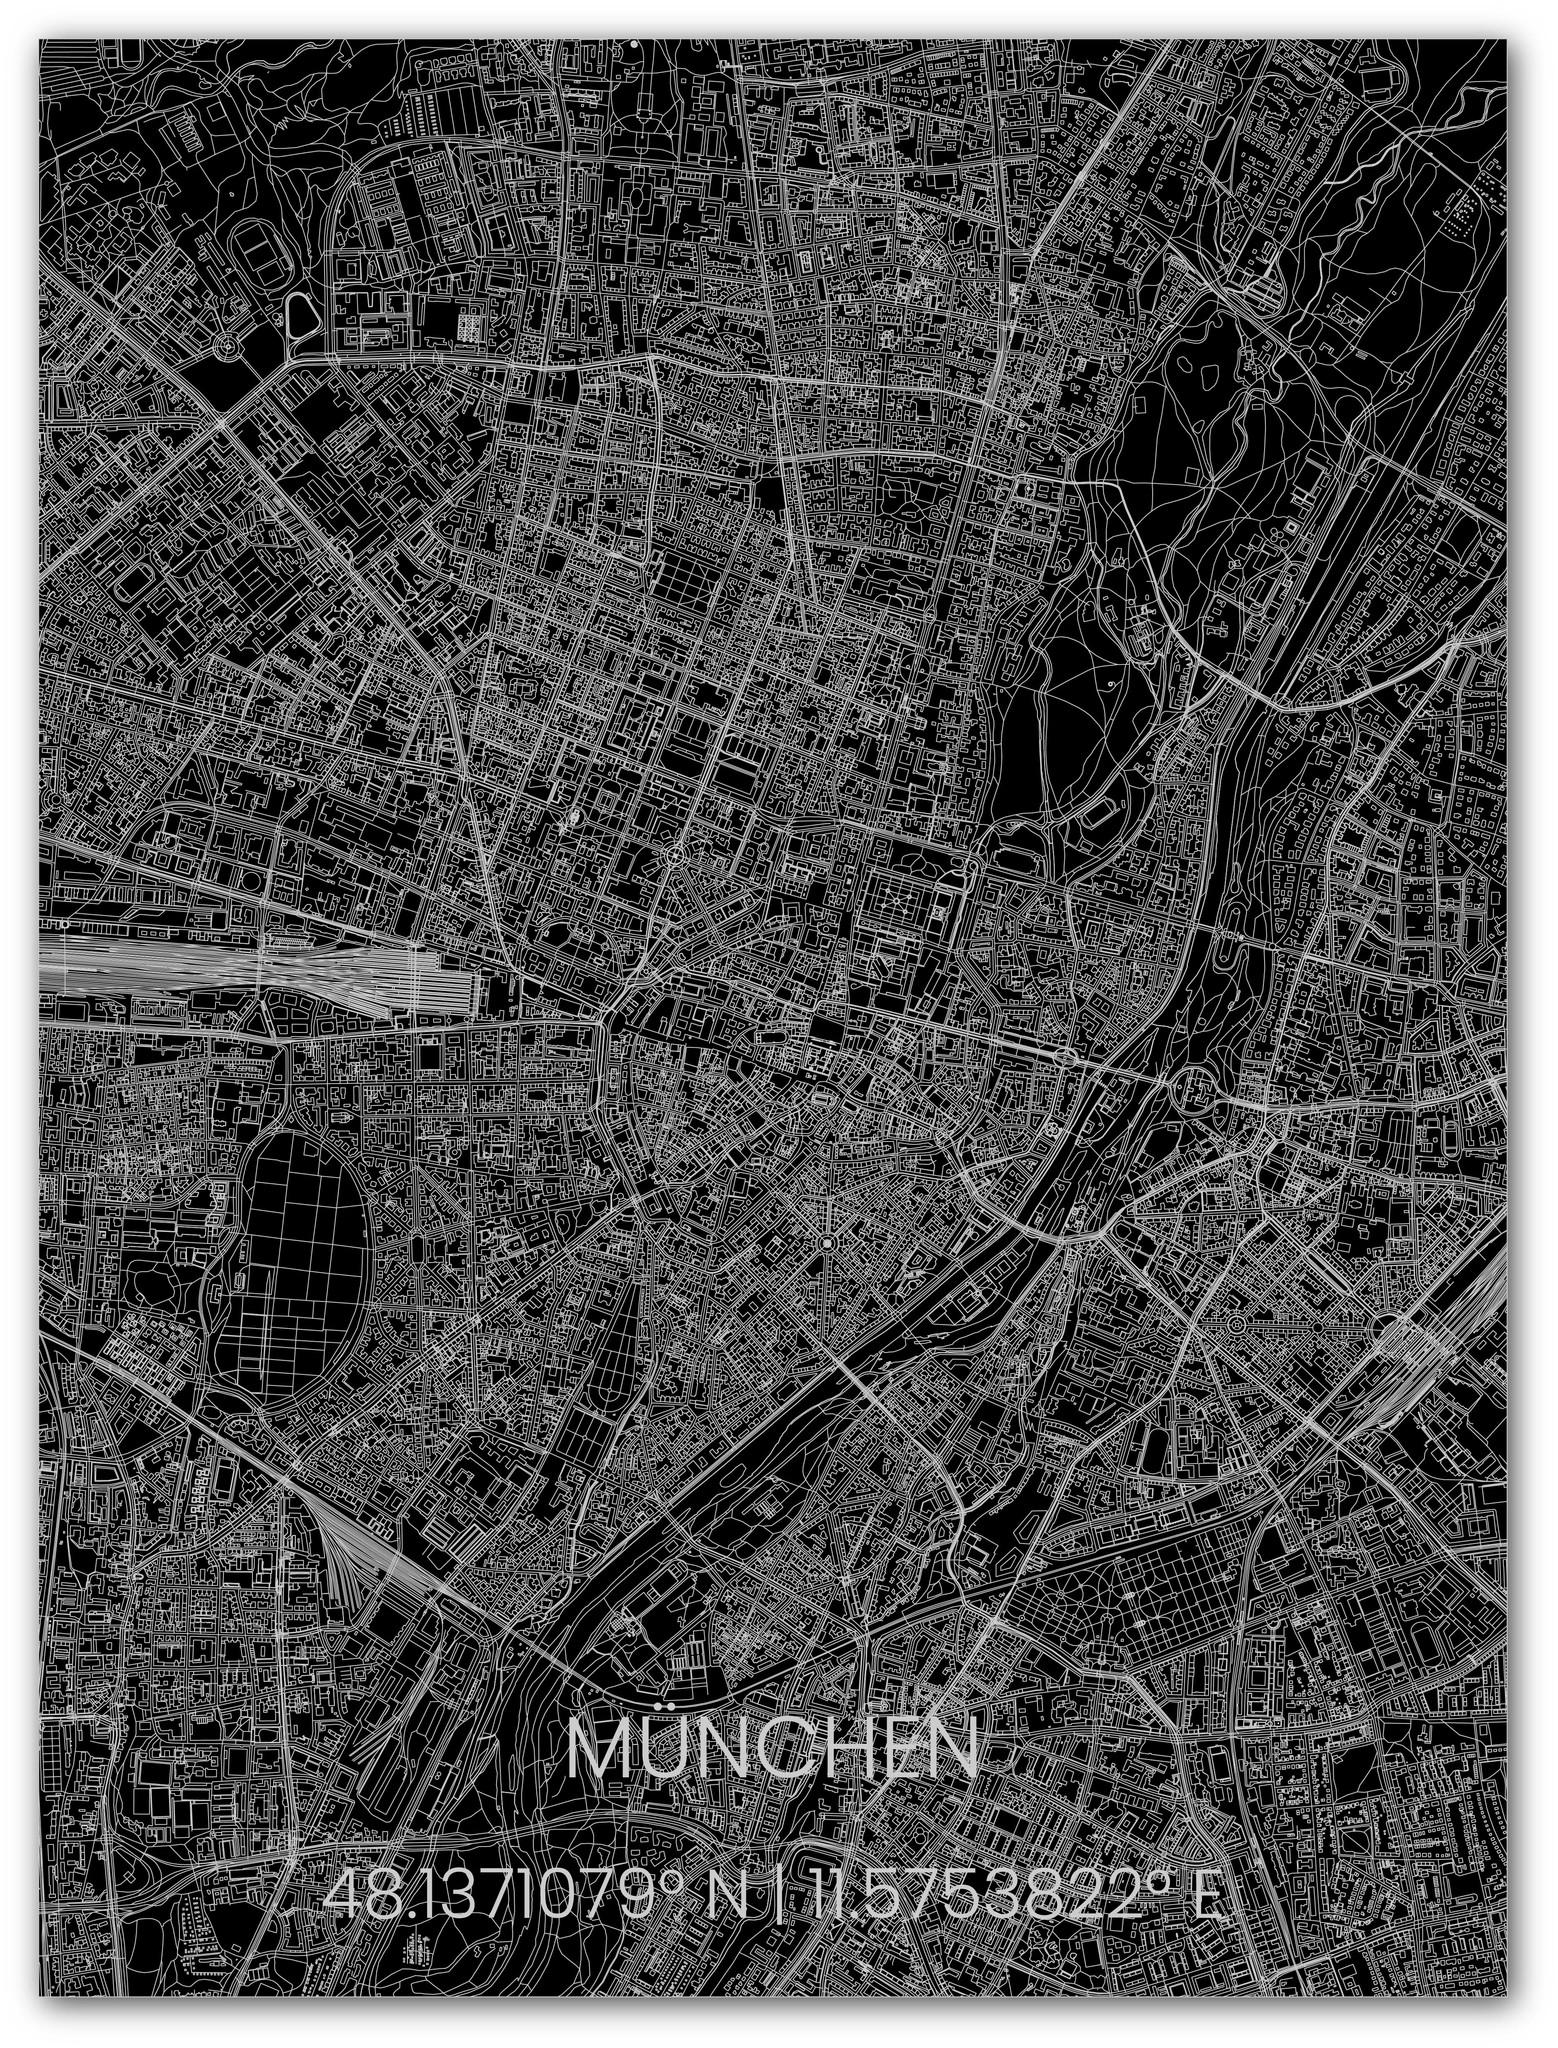 Stadtkarte Metal München-1